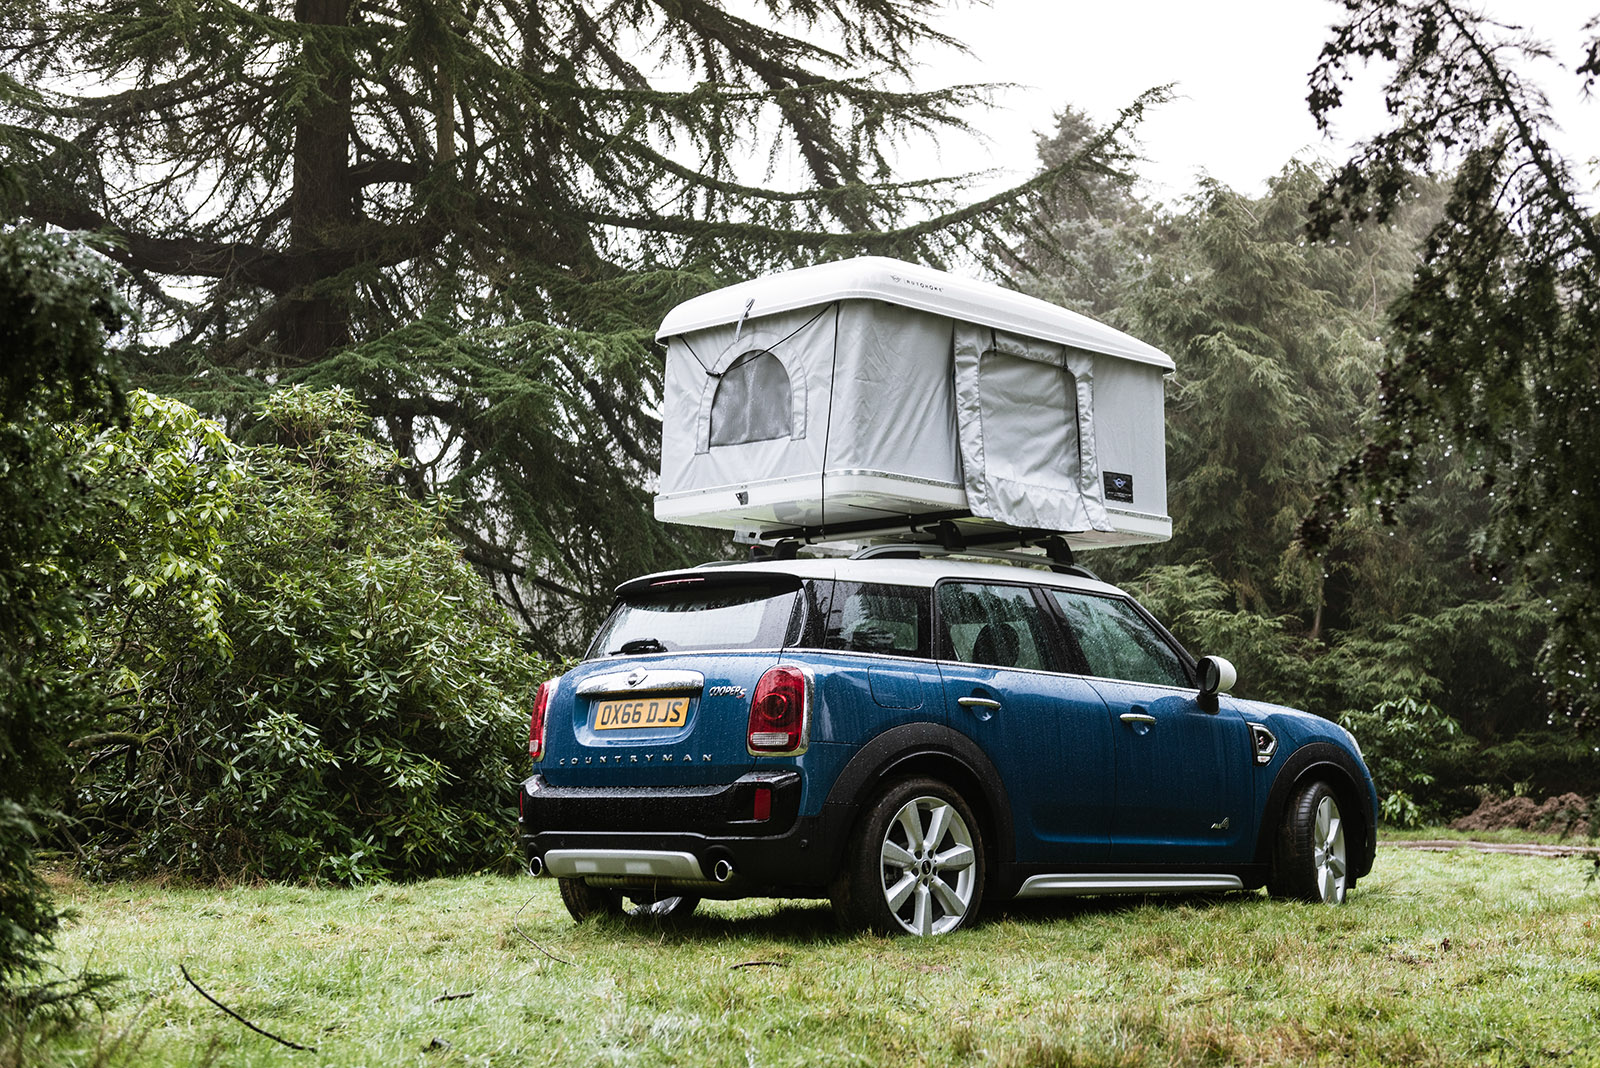 Picknick in Oxfordshire: Unterwegs mit dem neuen MINI Countryman 1